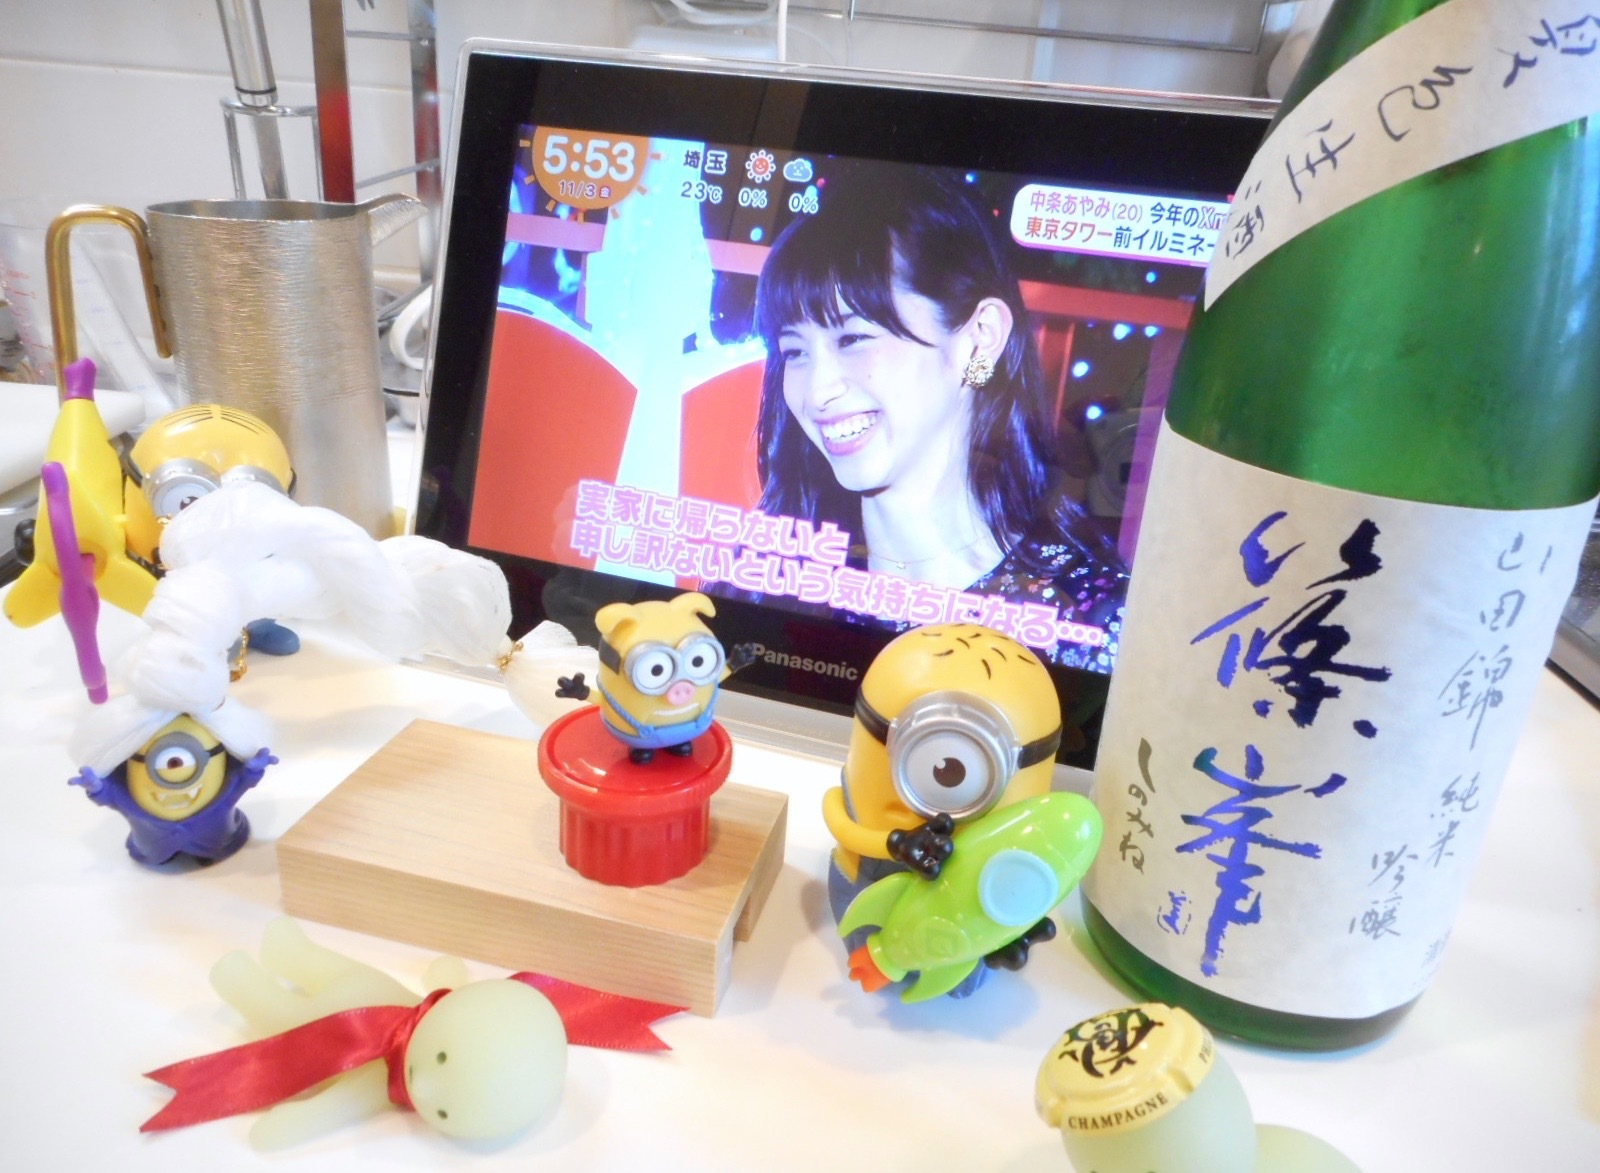 shinomine_sou_natsuiro28by3.jpg